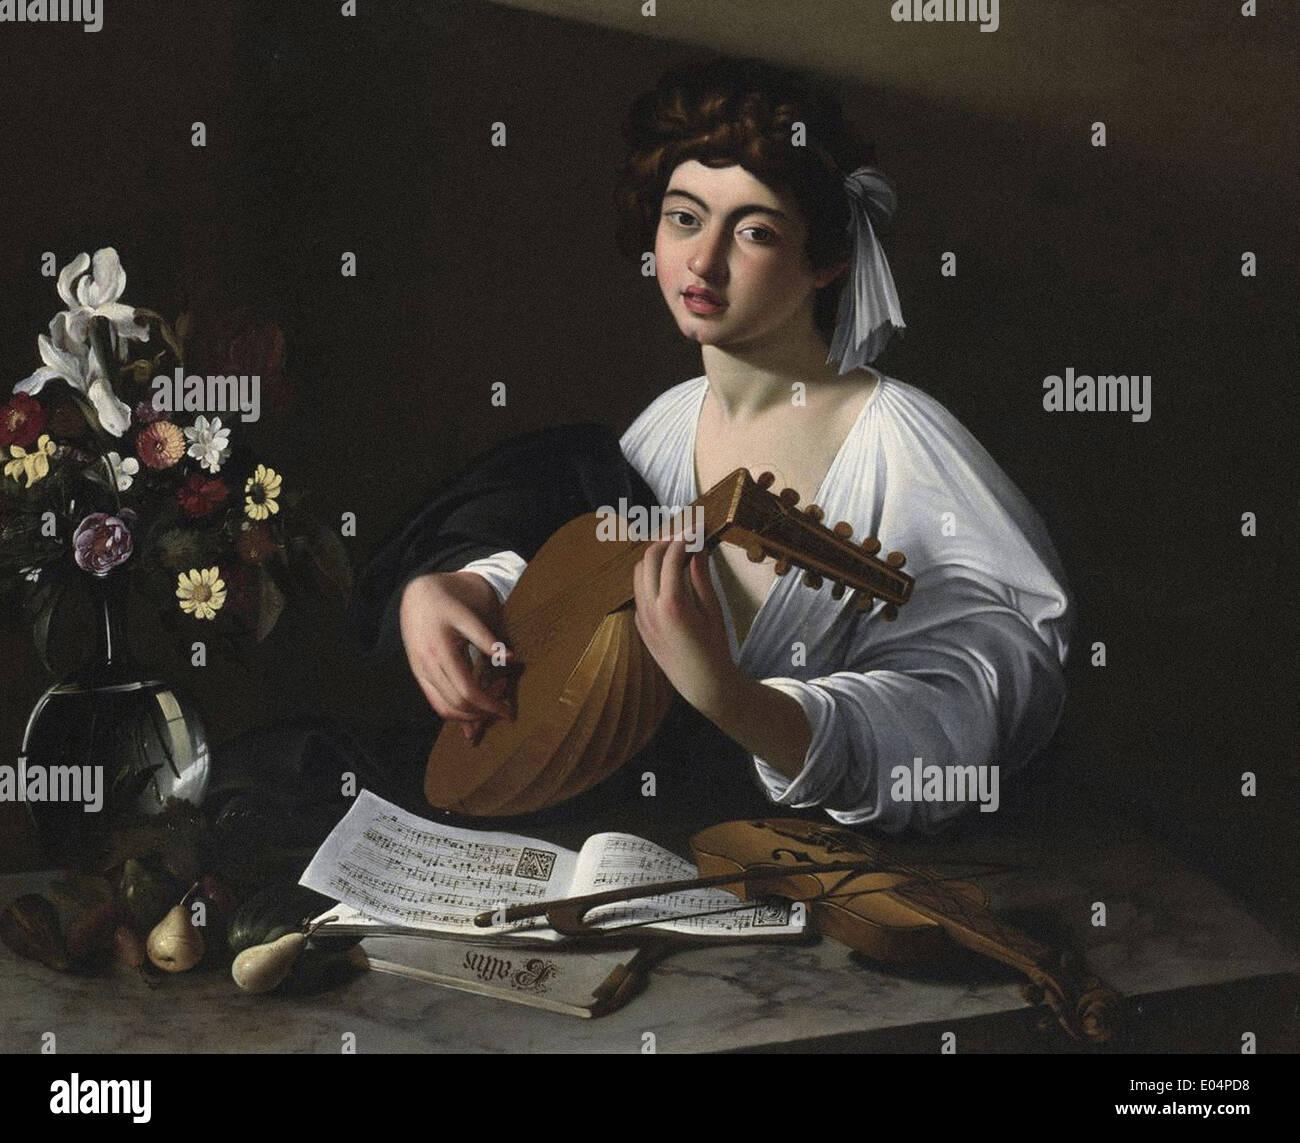 Caravaggio The Lute Player - Stock Image